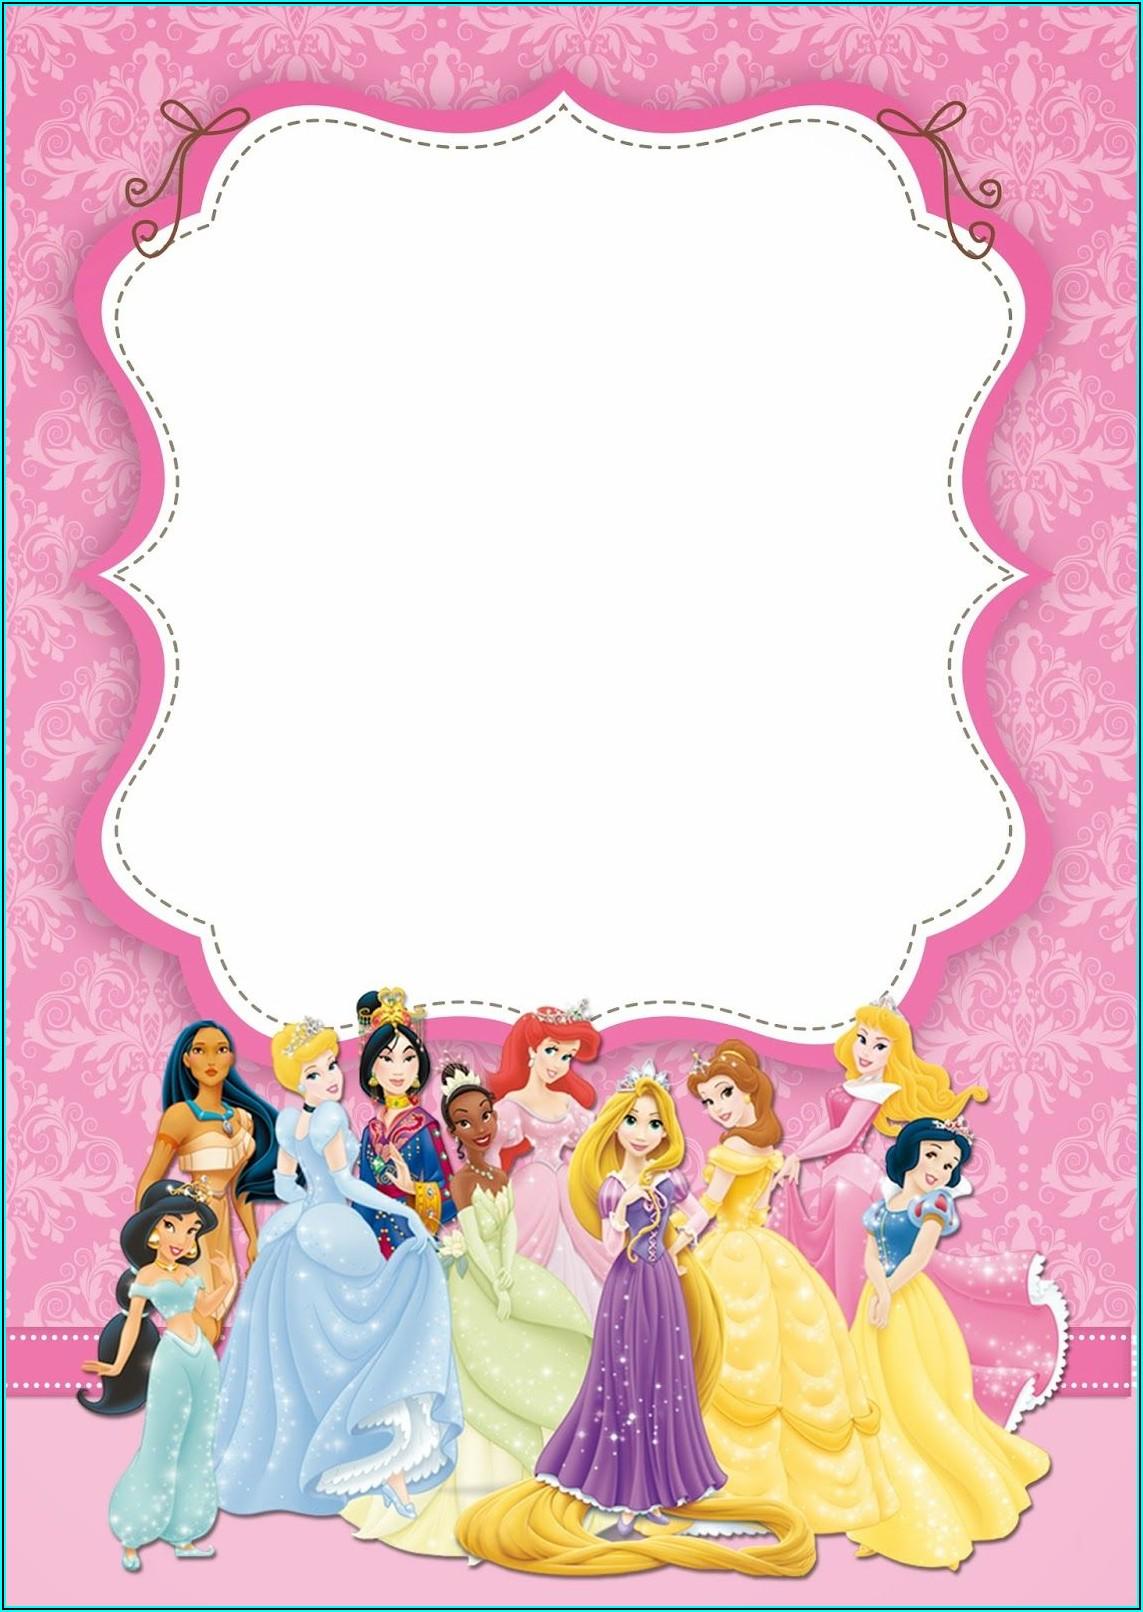 Disney Princess Birthday Invitation Template Free Download